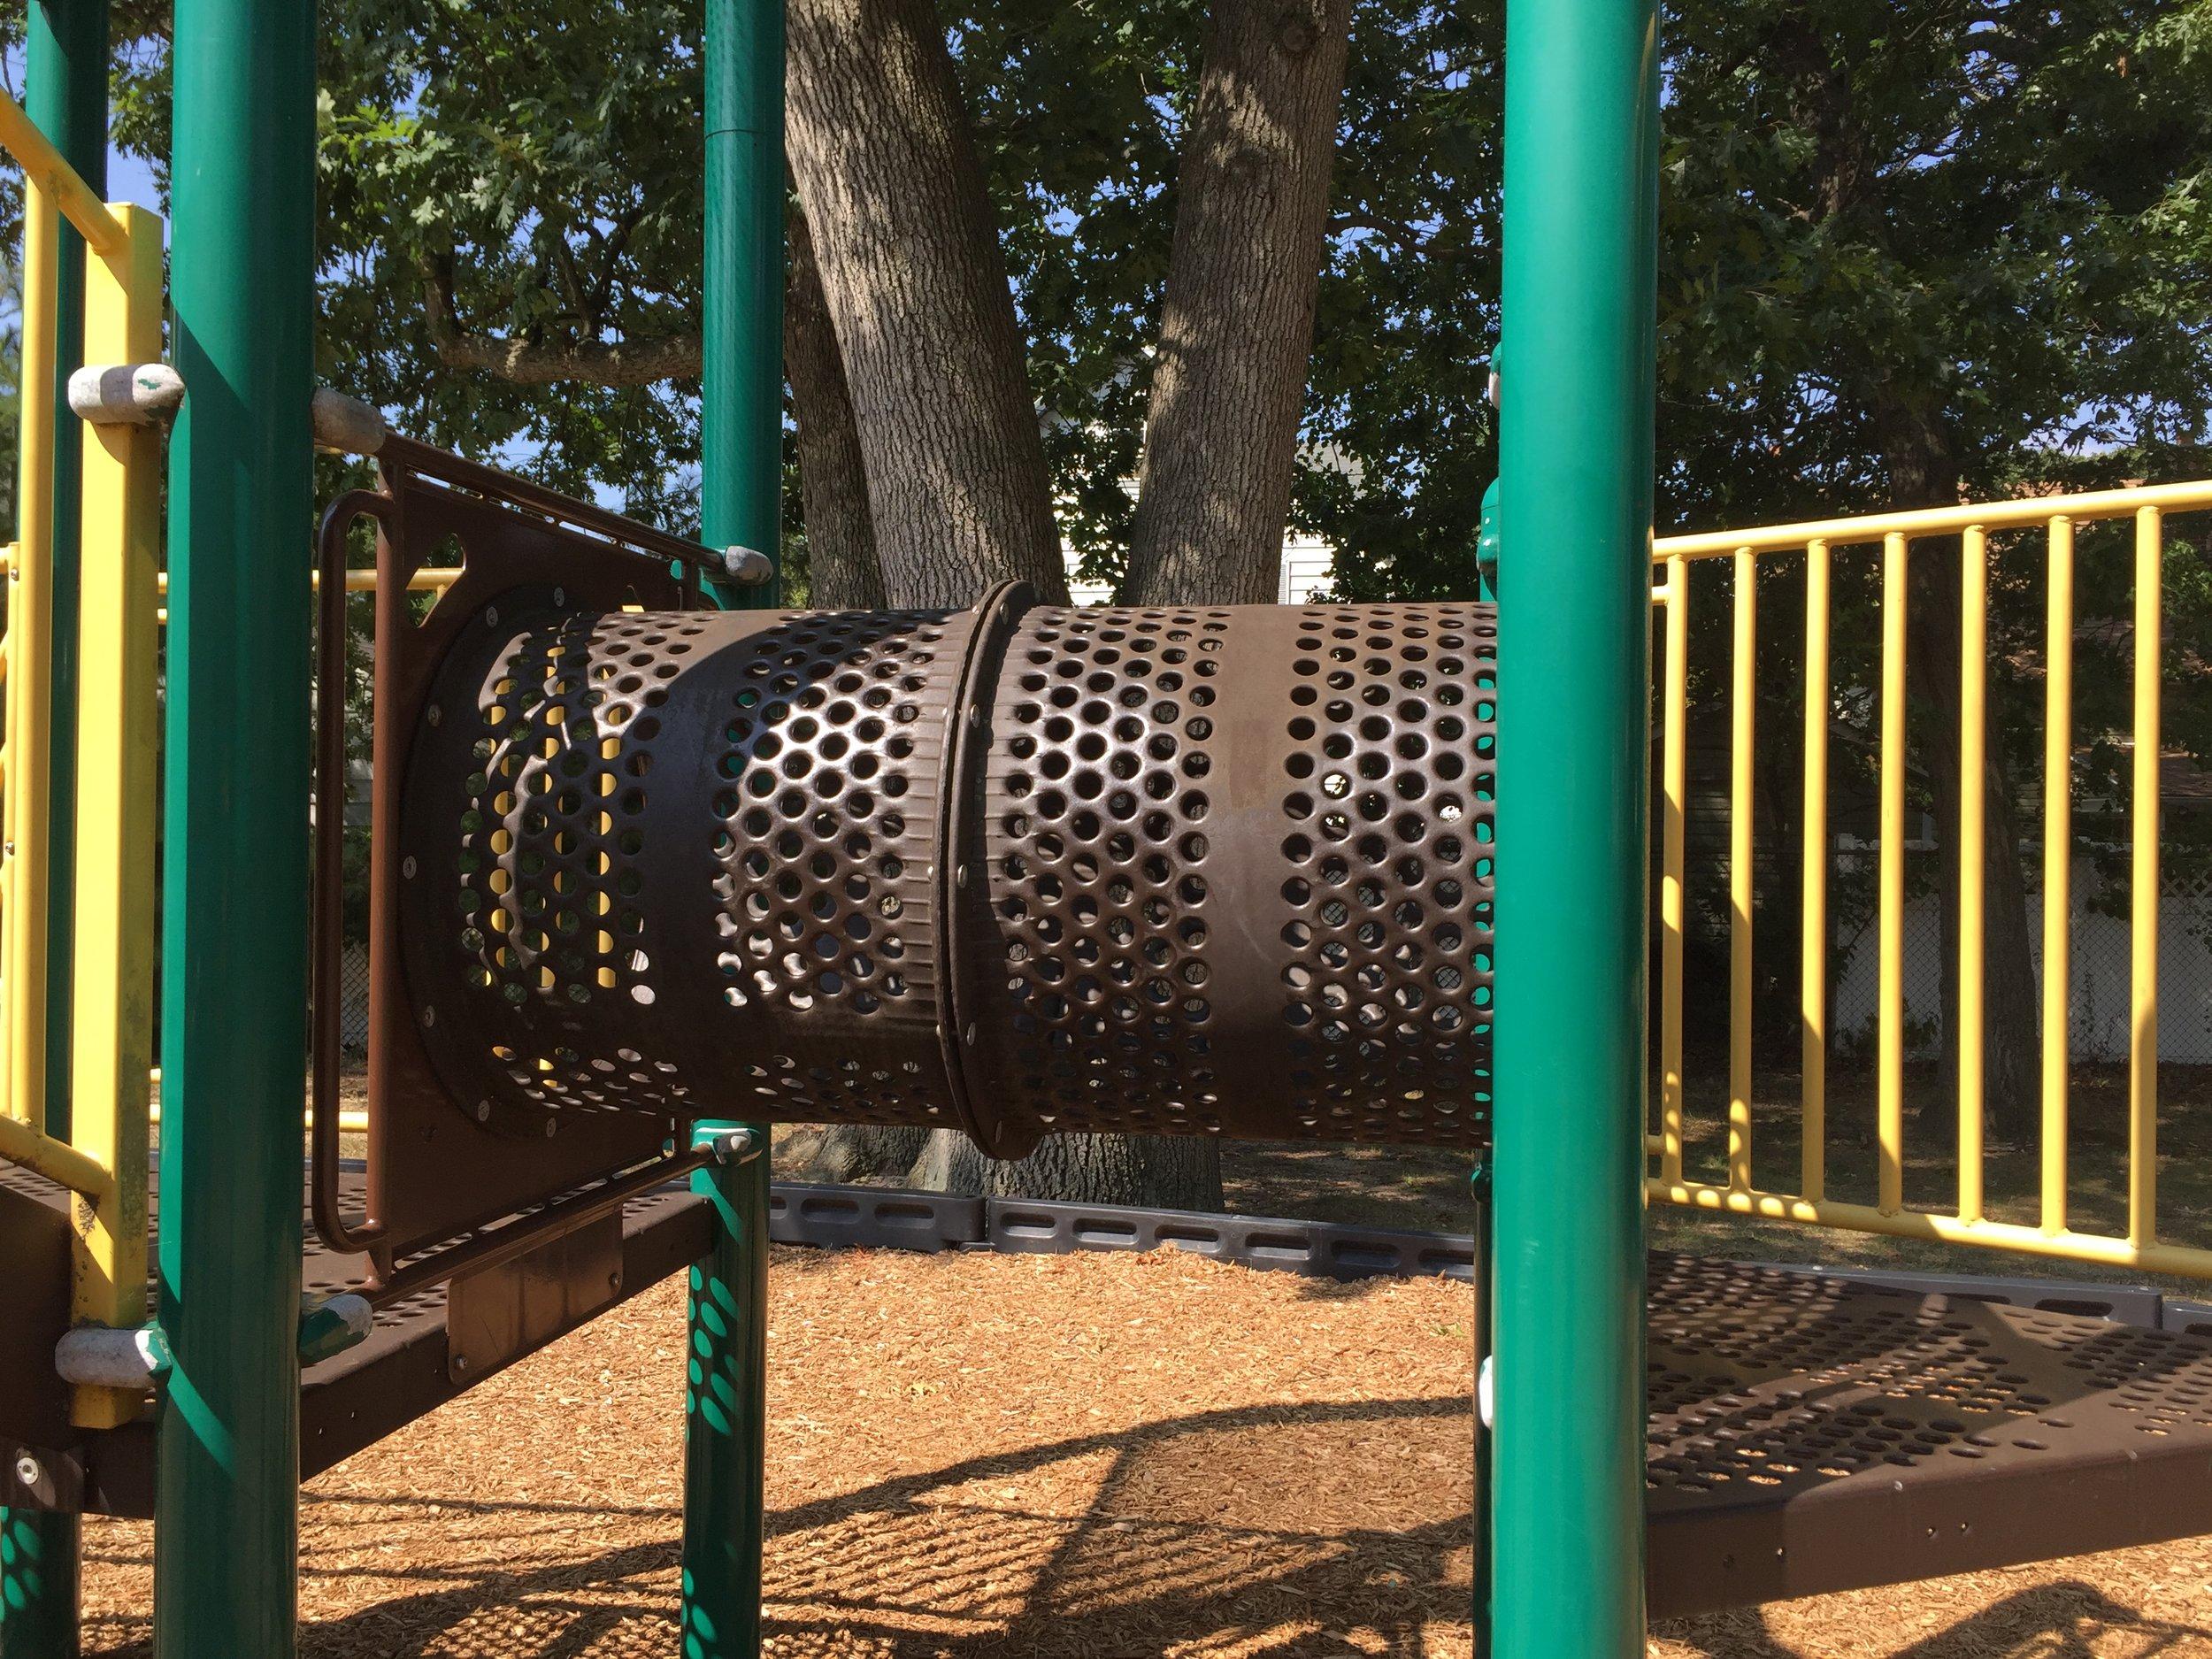 Playground at Larsen Park